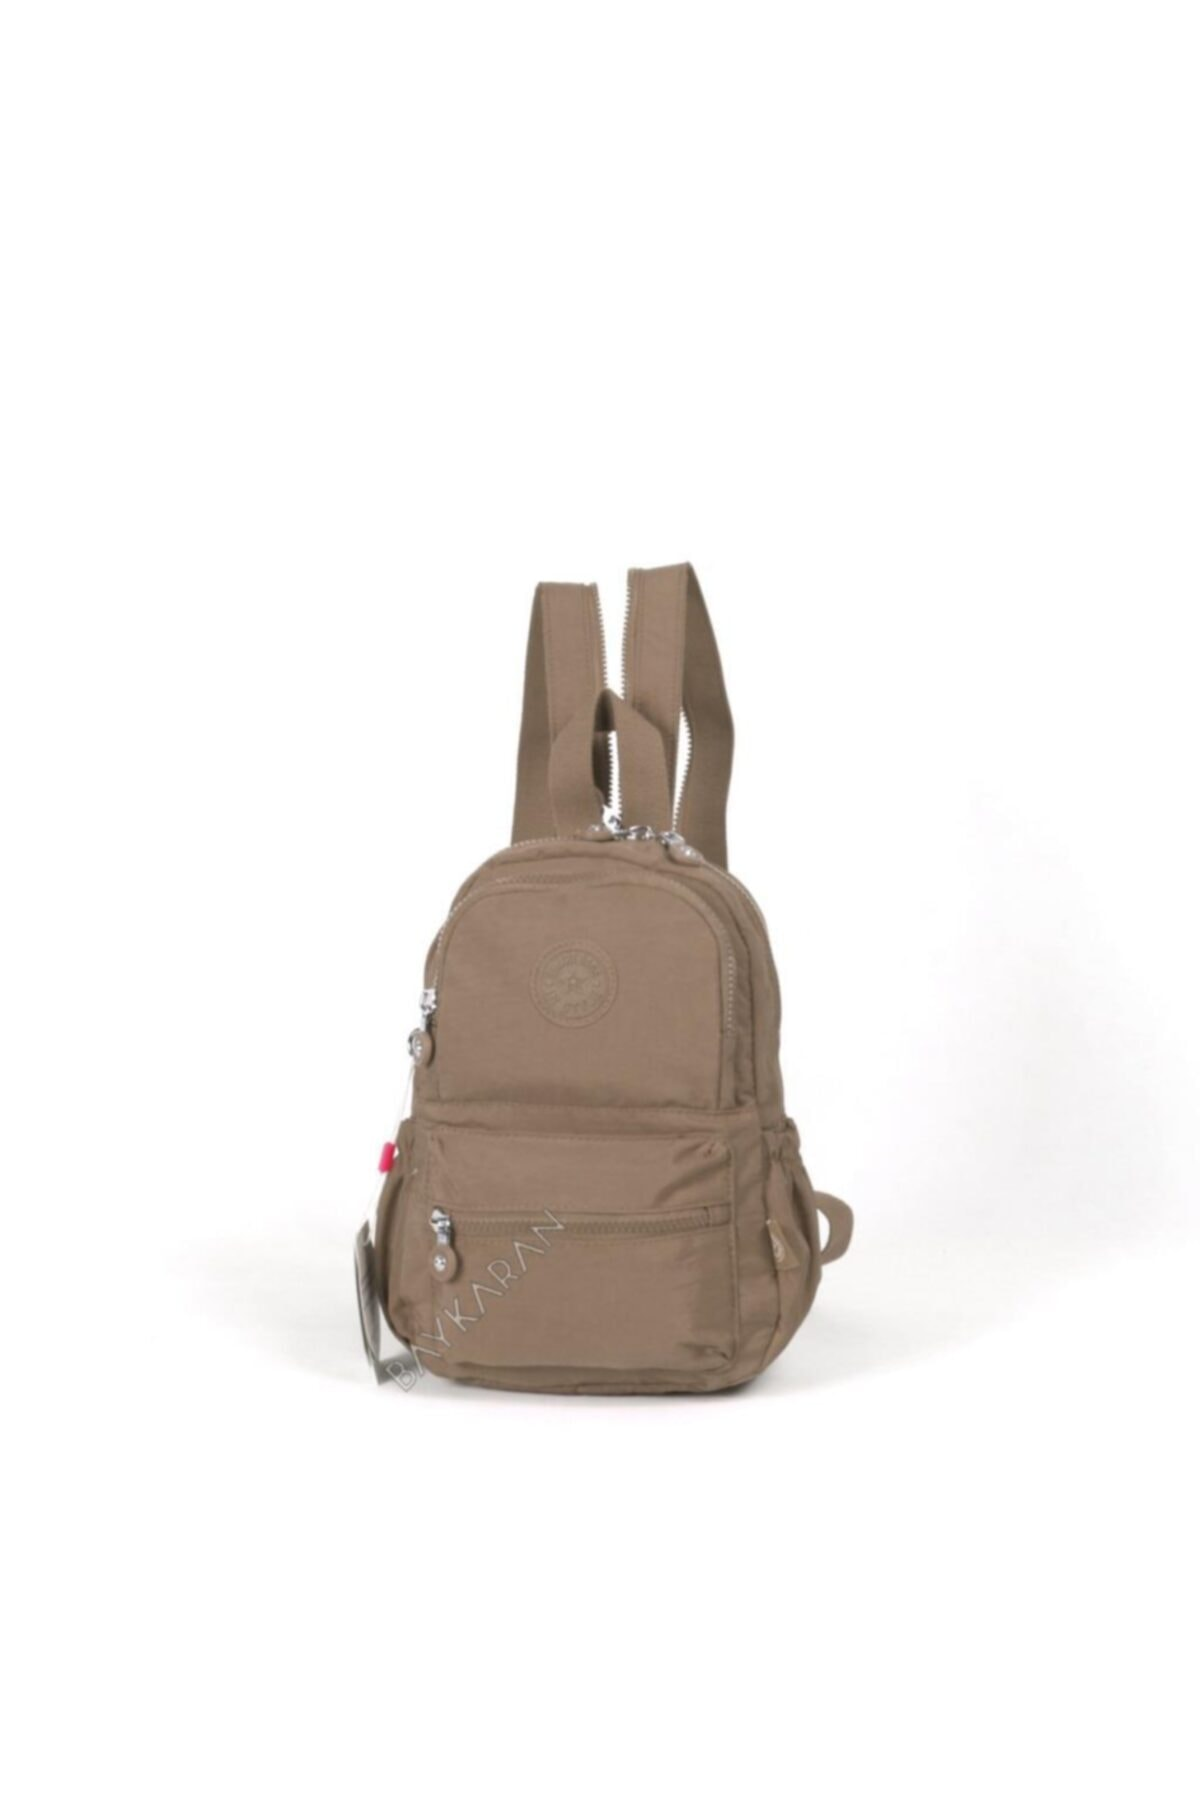 SMART BAGS Smb1030-0007 A.kahverengi Kadın Küçük Sırt Çantası 1